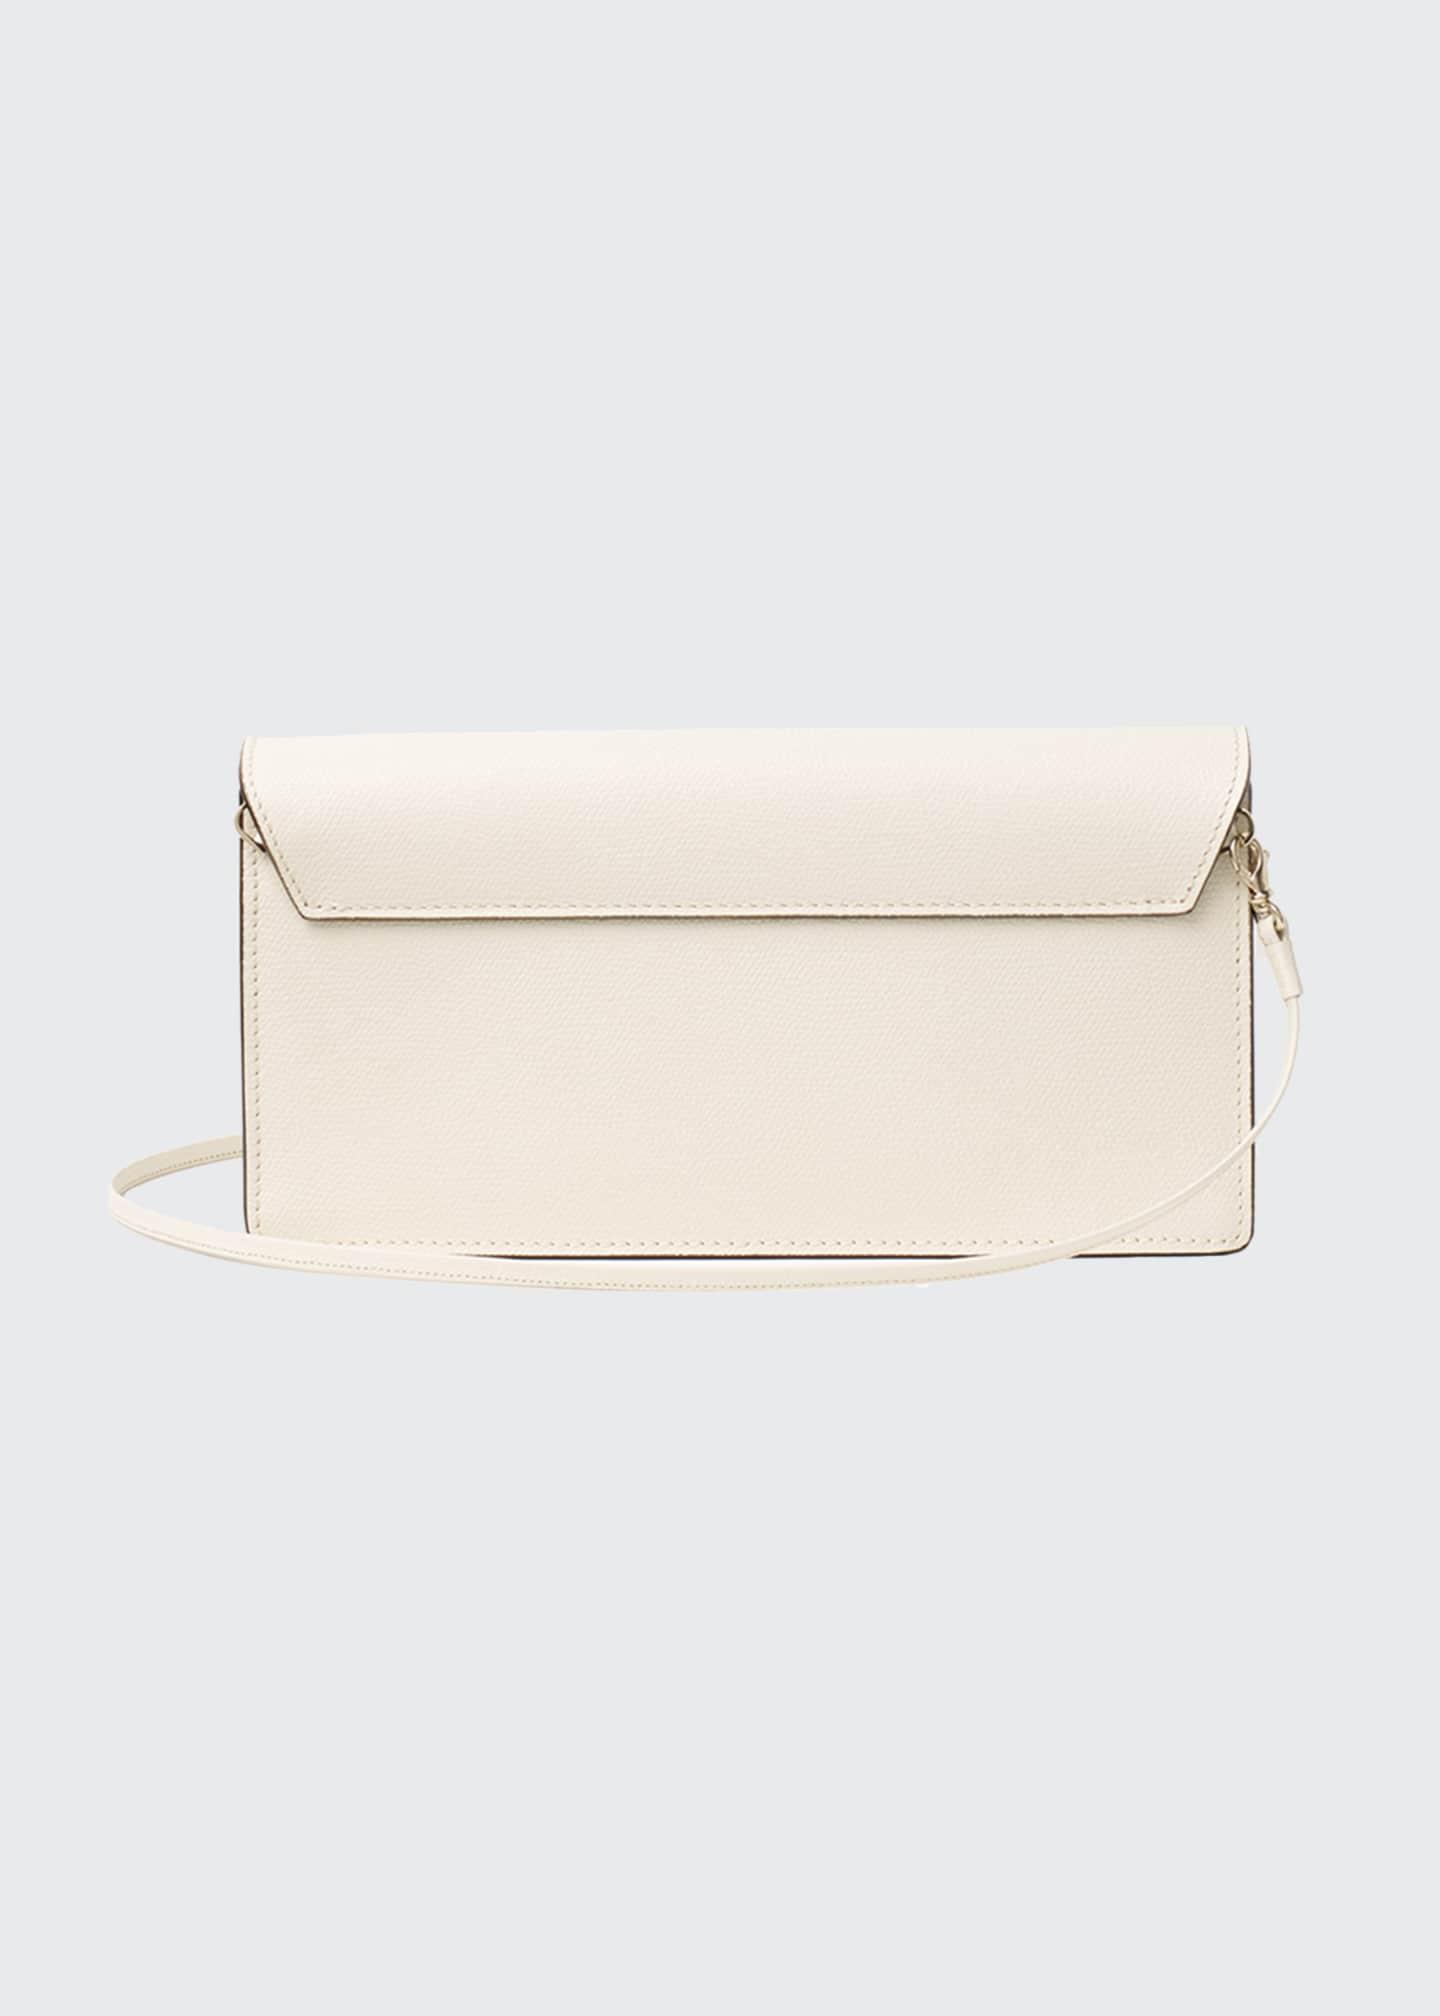 Valextra Iside Leather Envelope Clutch Bag - Bergdorf Goodman